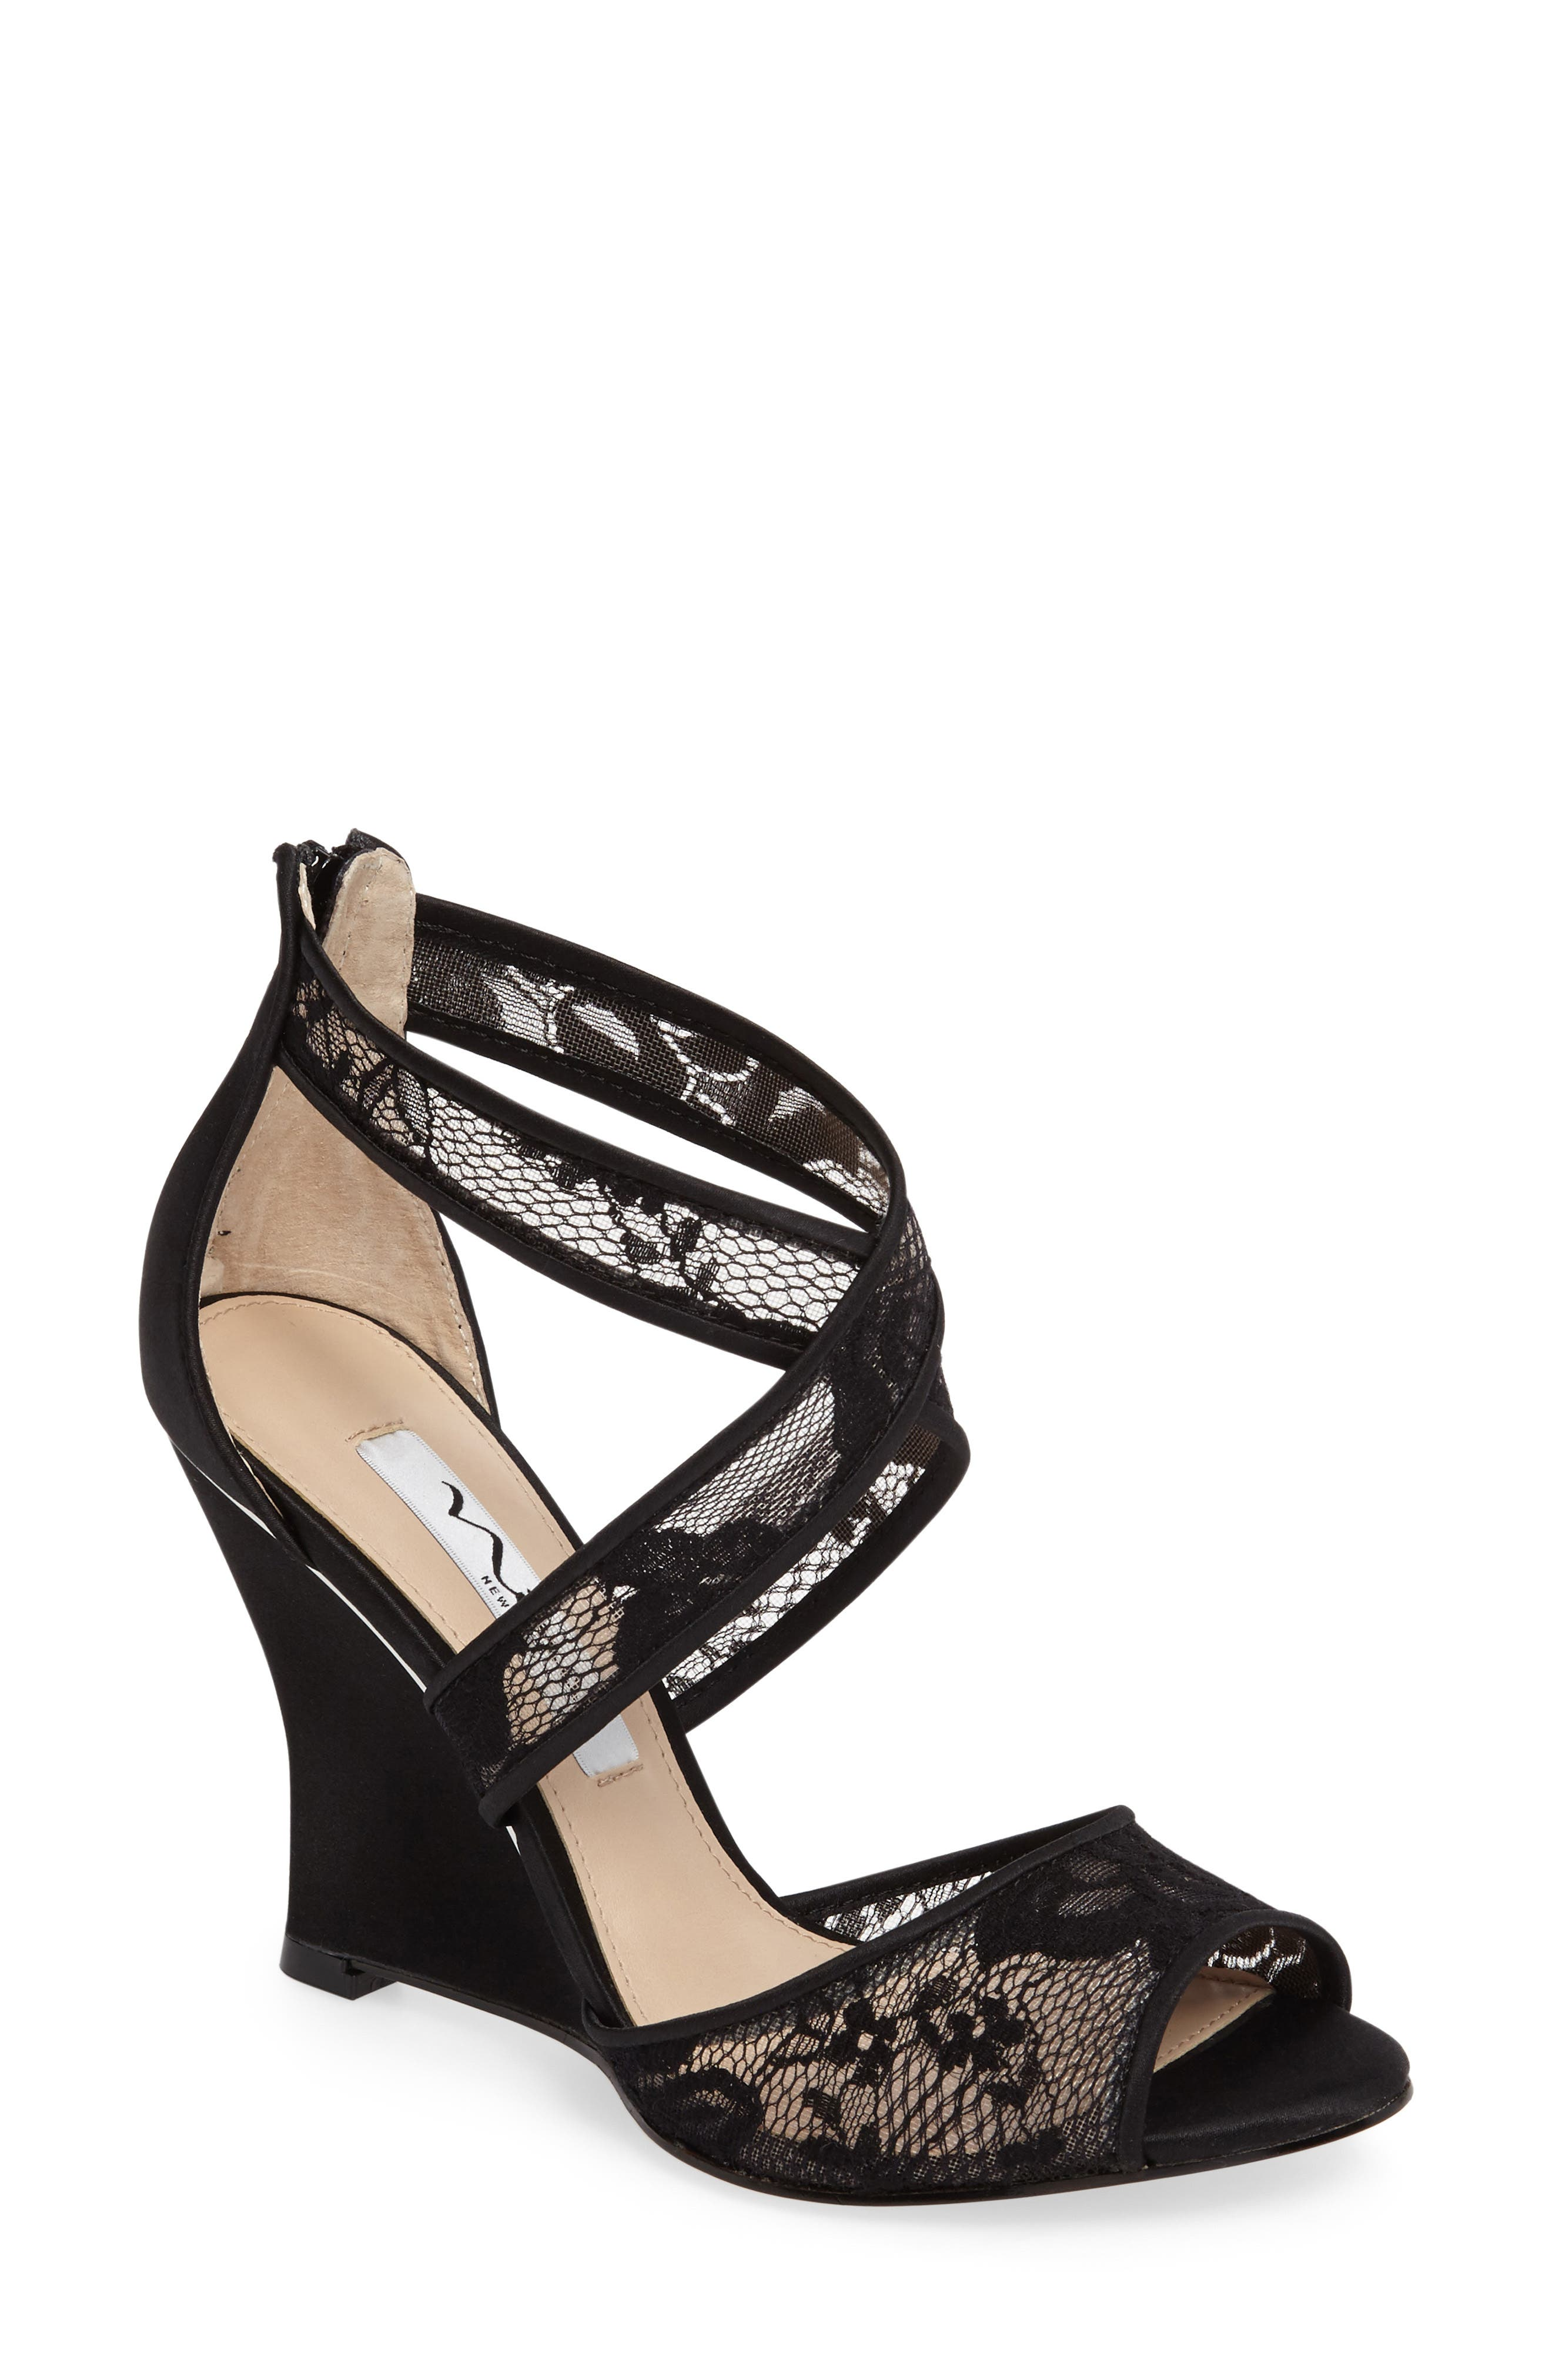 Elyana Strappy Wedge Sandal,                         Main,                         color, 001